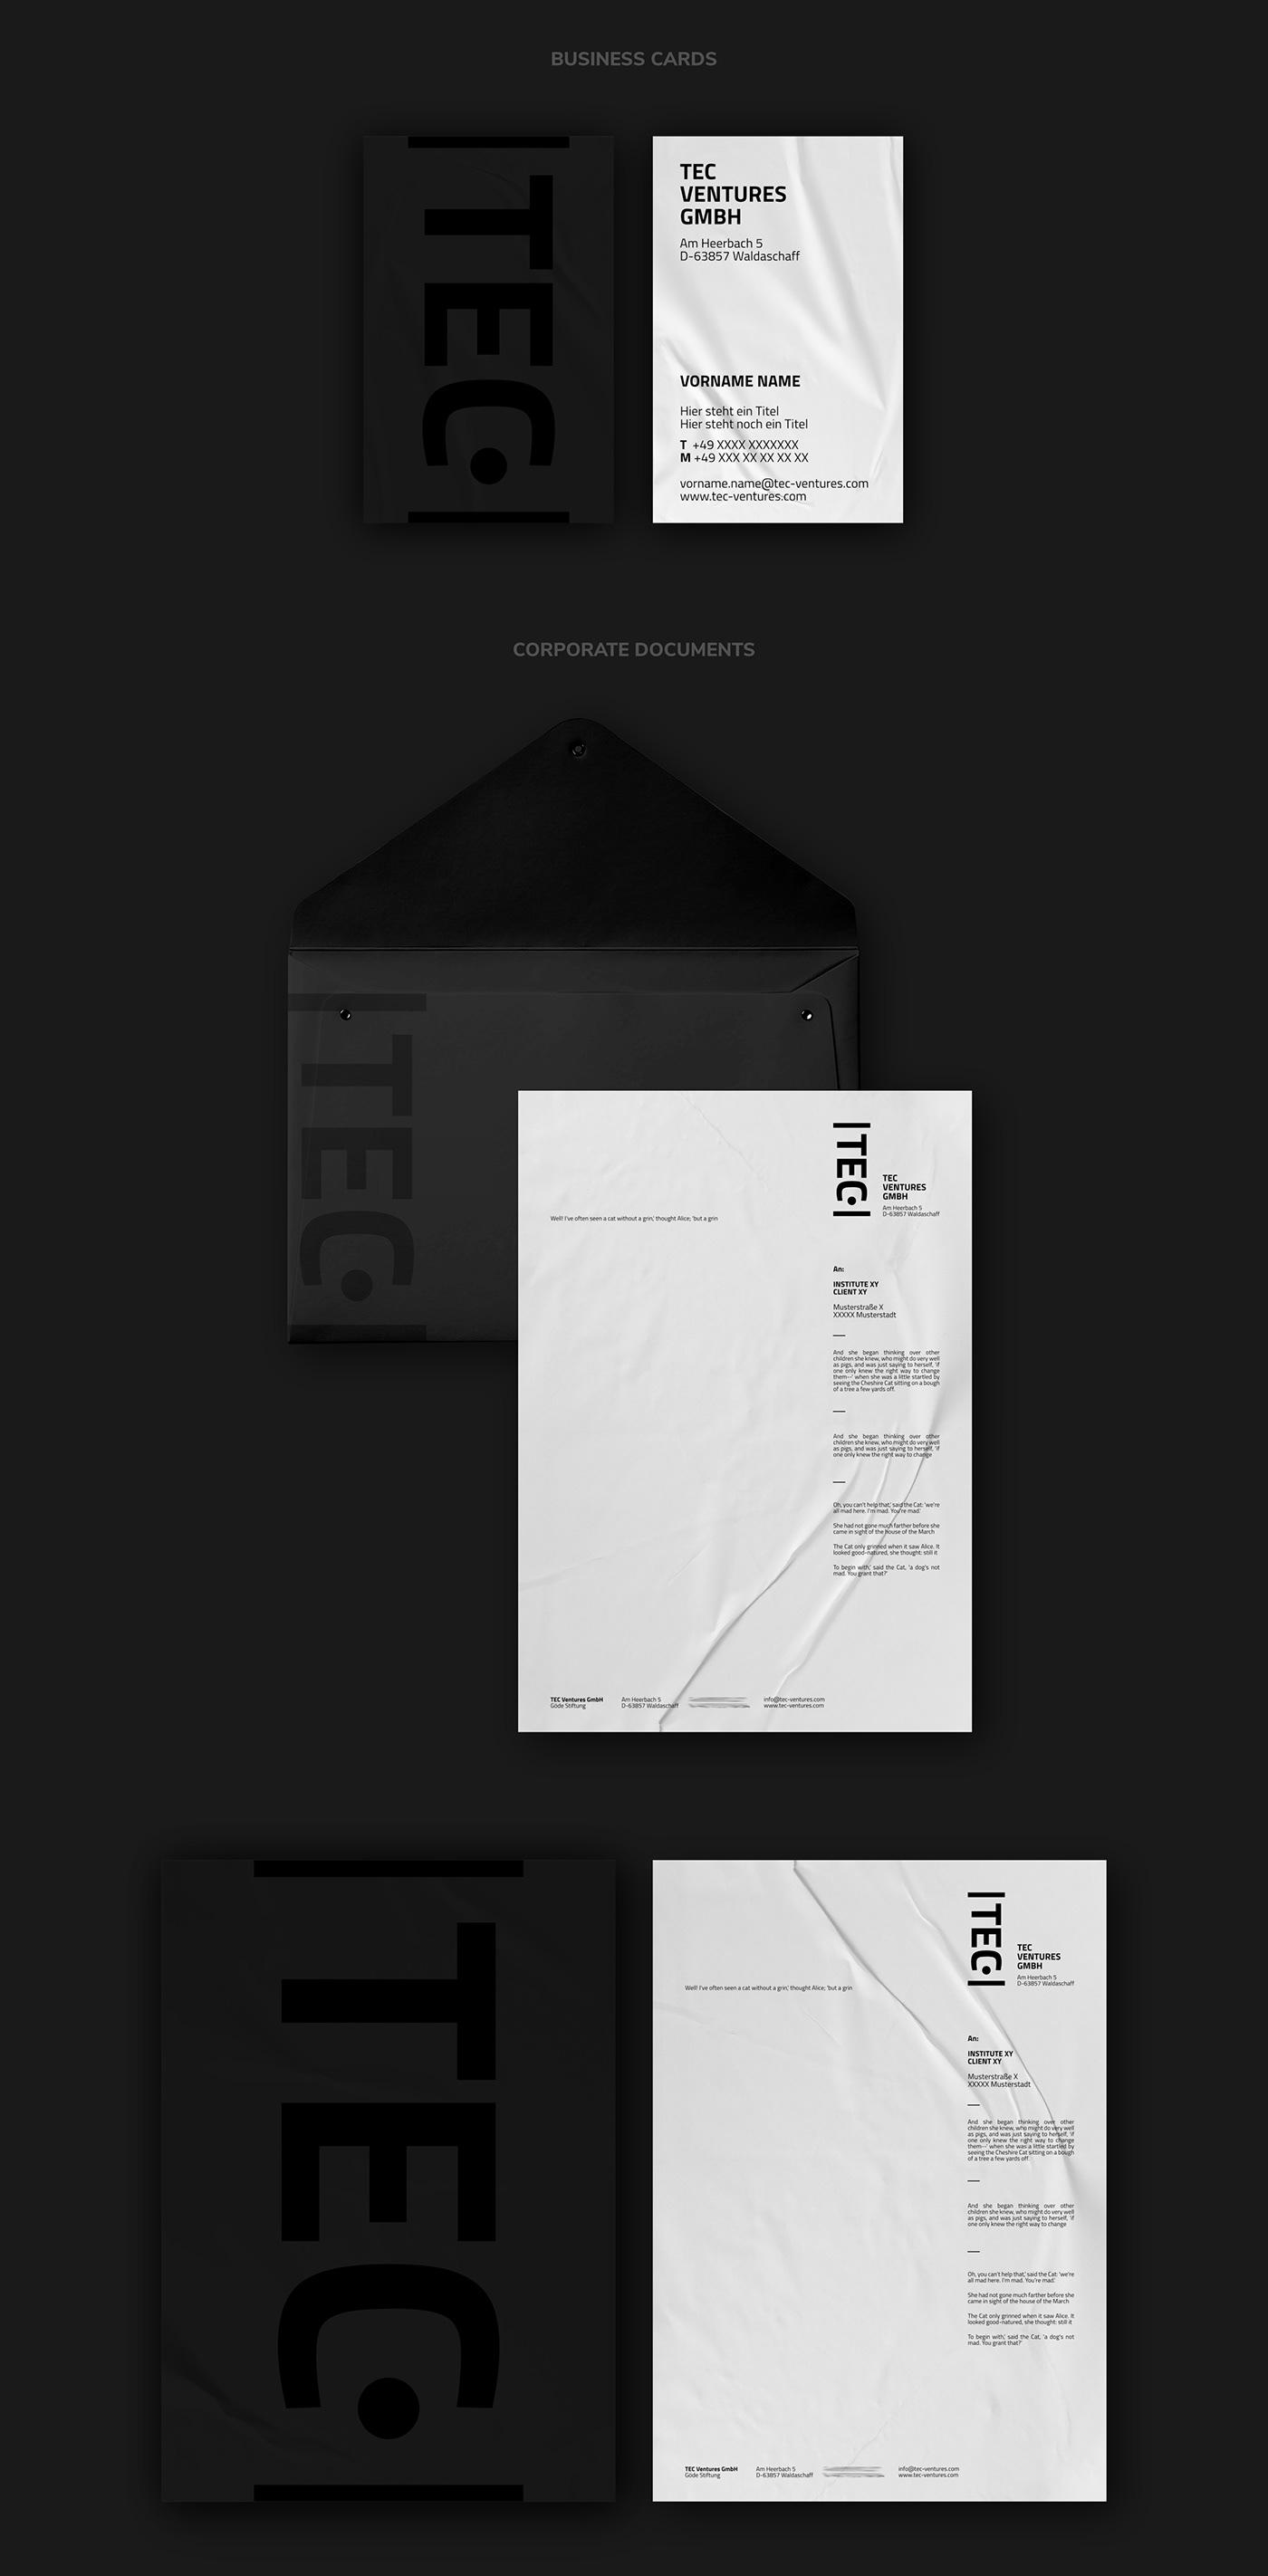 TEC VENTURES // Cards & Documents